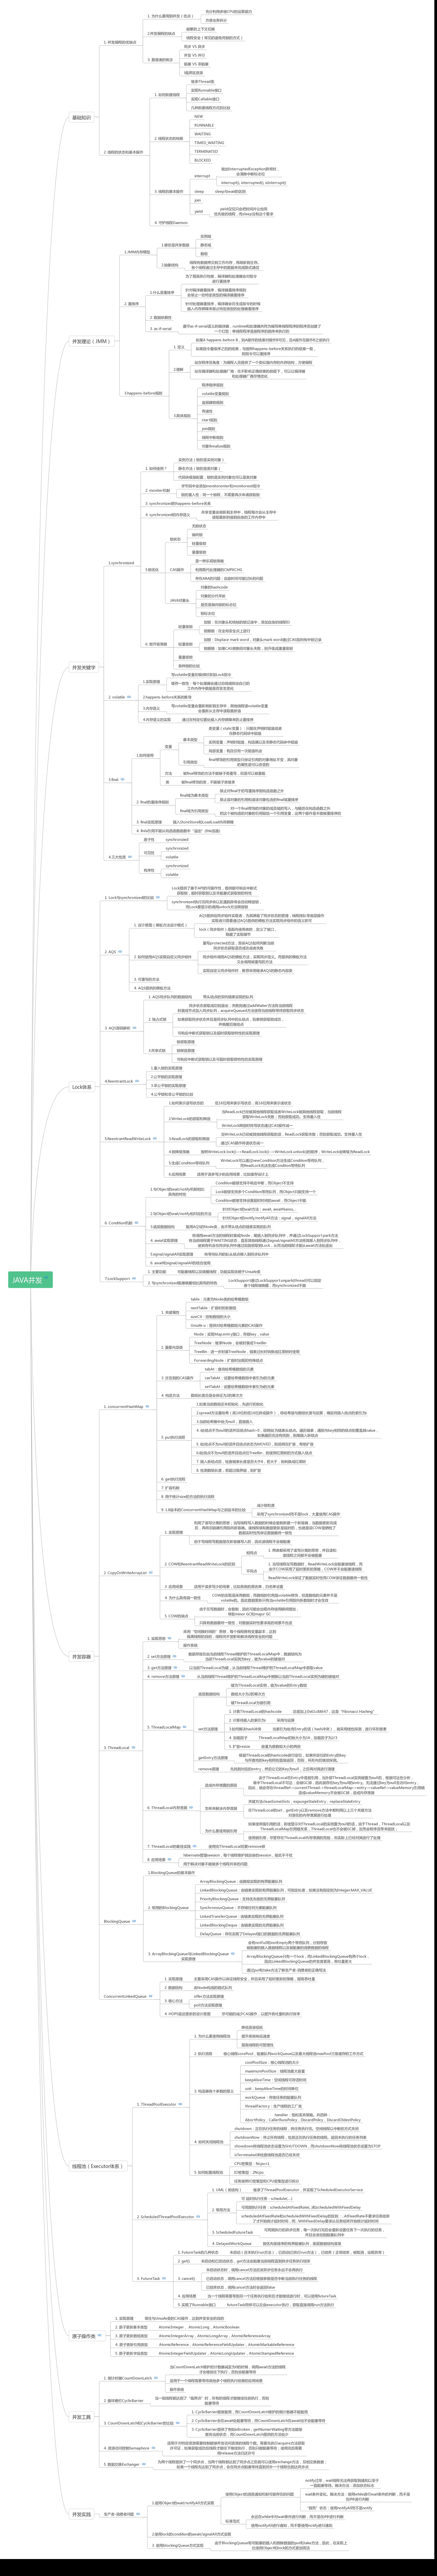 Java并发知识图谱.png